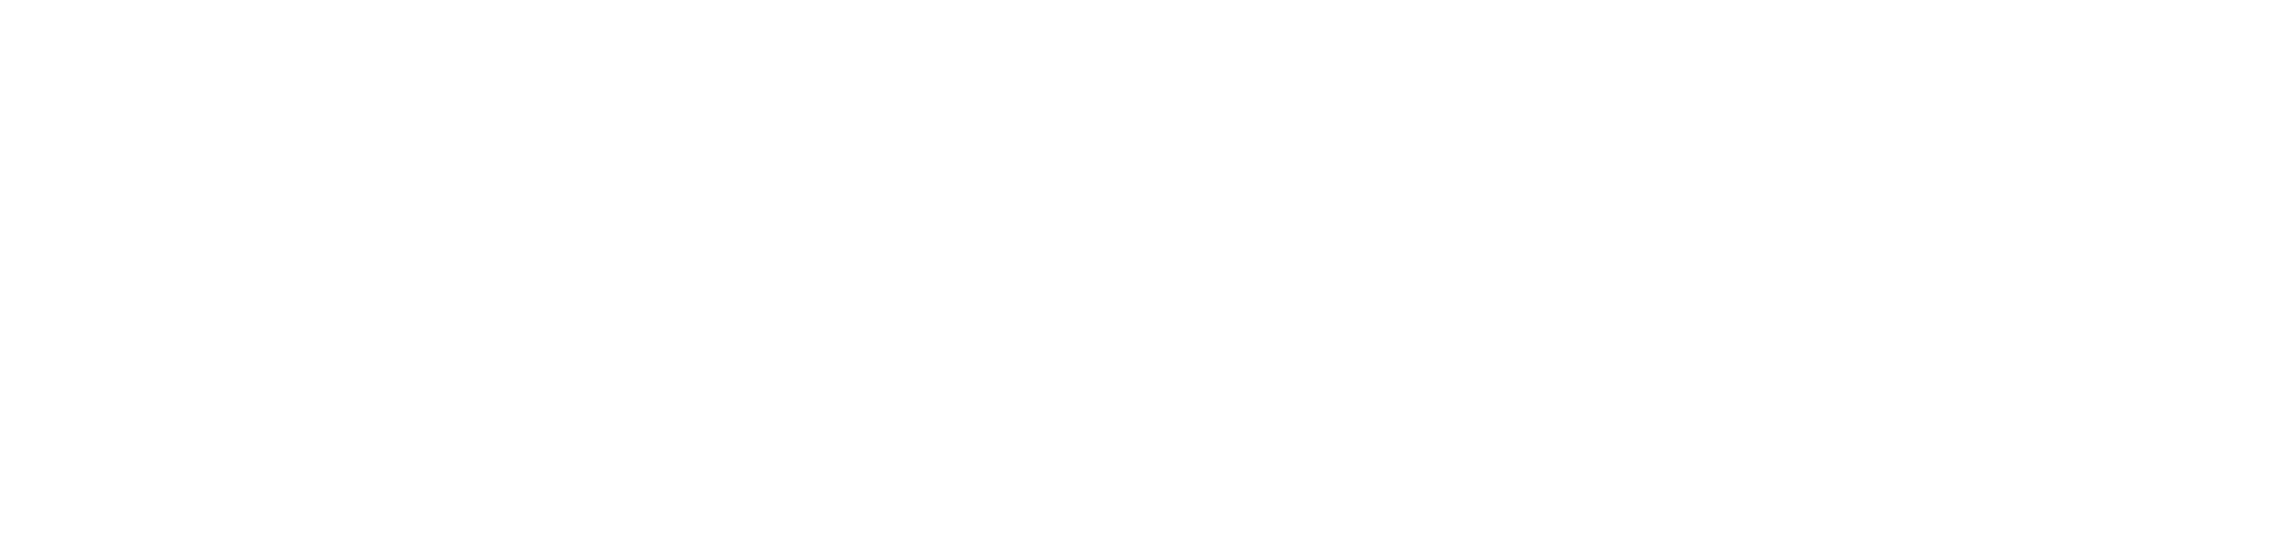 Samsung-logo-2015-Nobg_white_smal